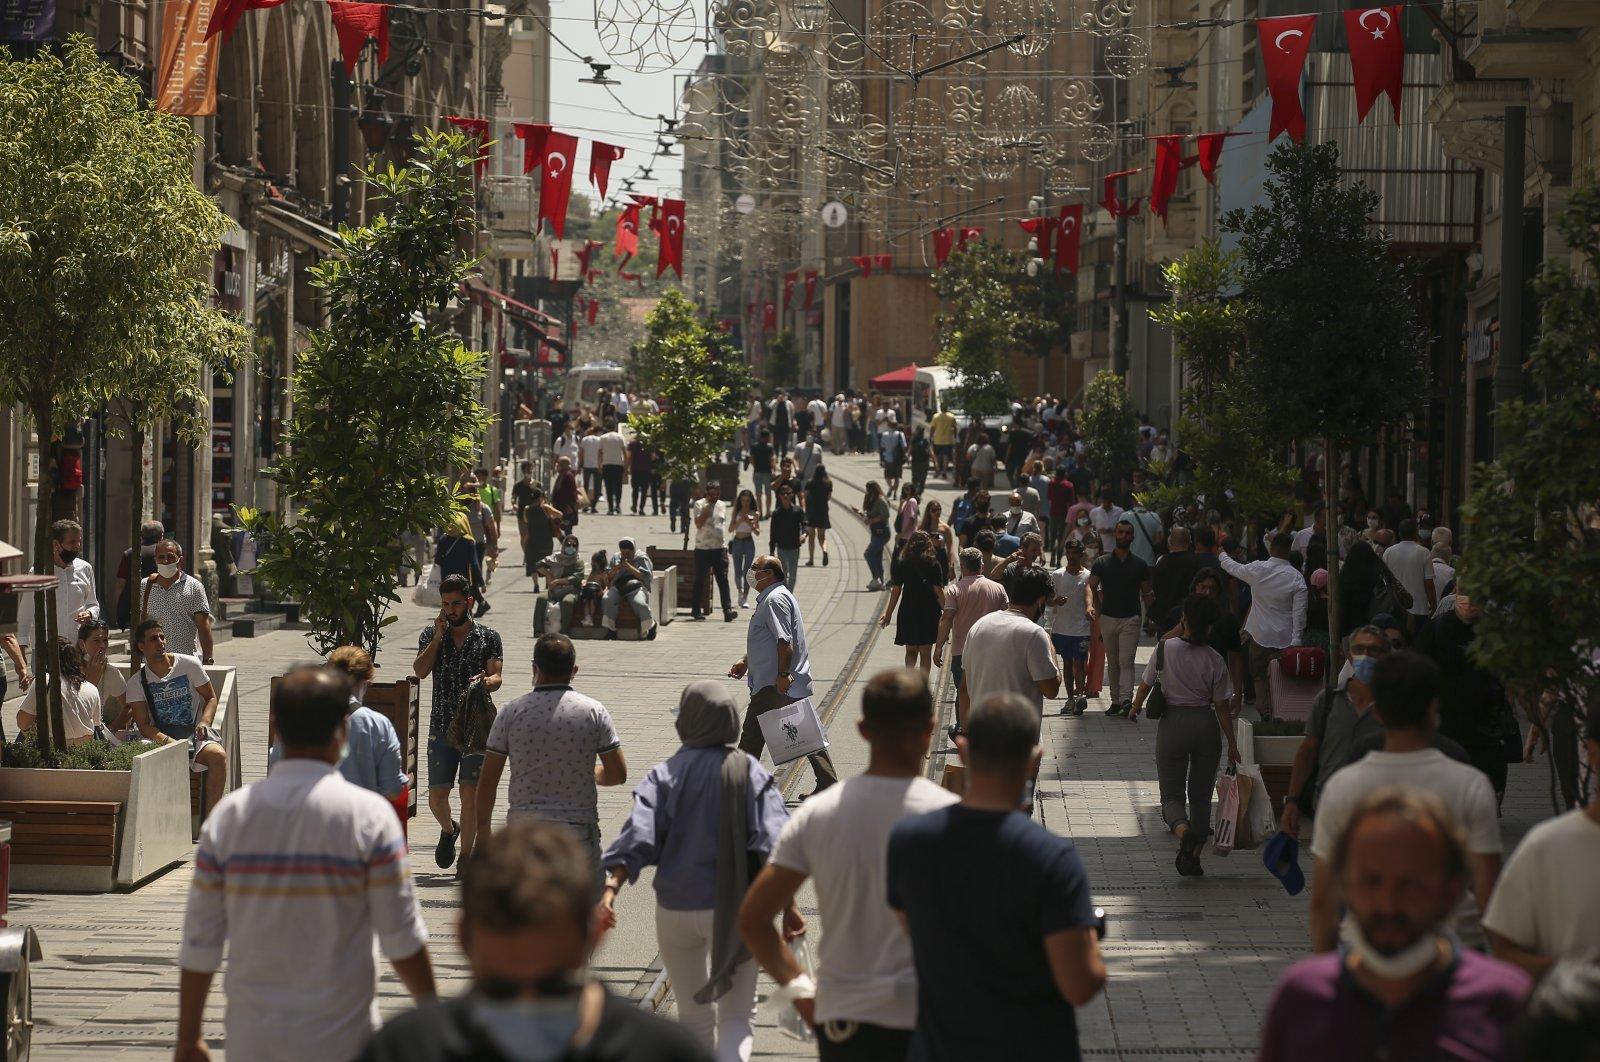 People walk on the busy shopping area of Istiklal Street, Beyoğlu, Istanbul, Turkey, July 1, 2021. (AP Photo)